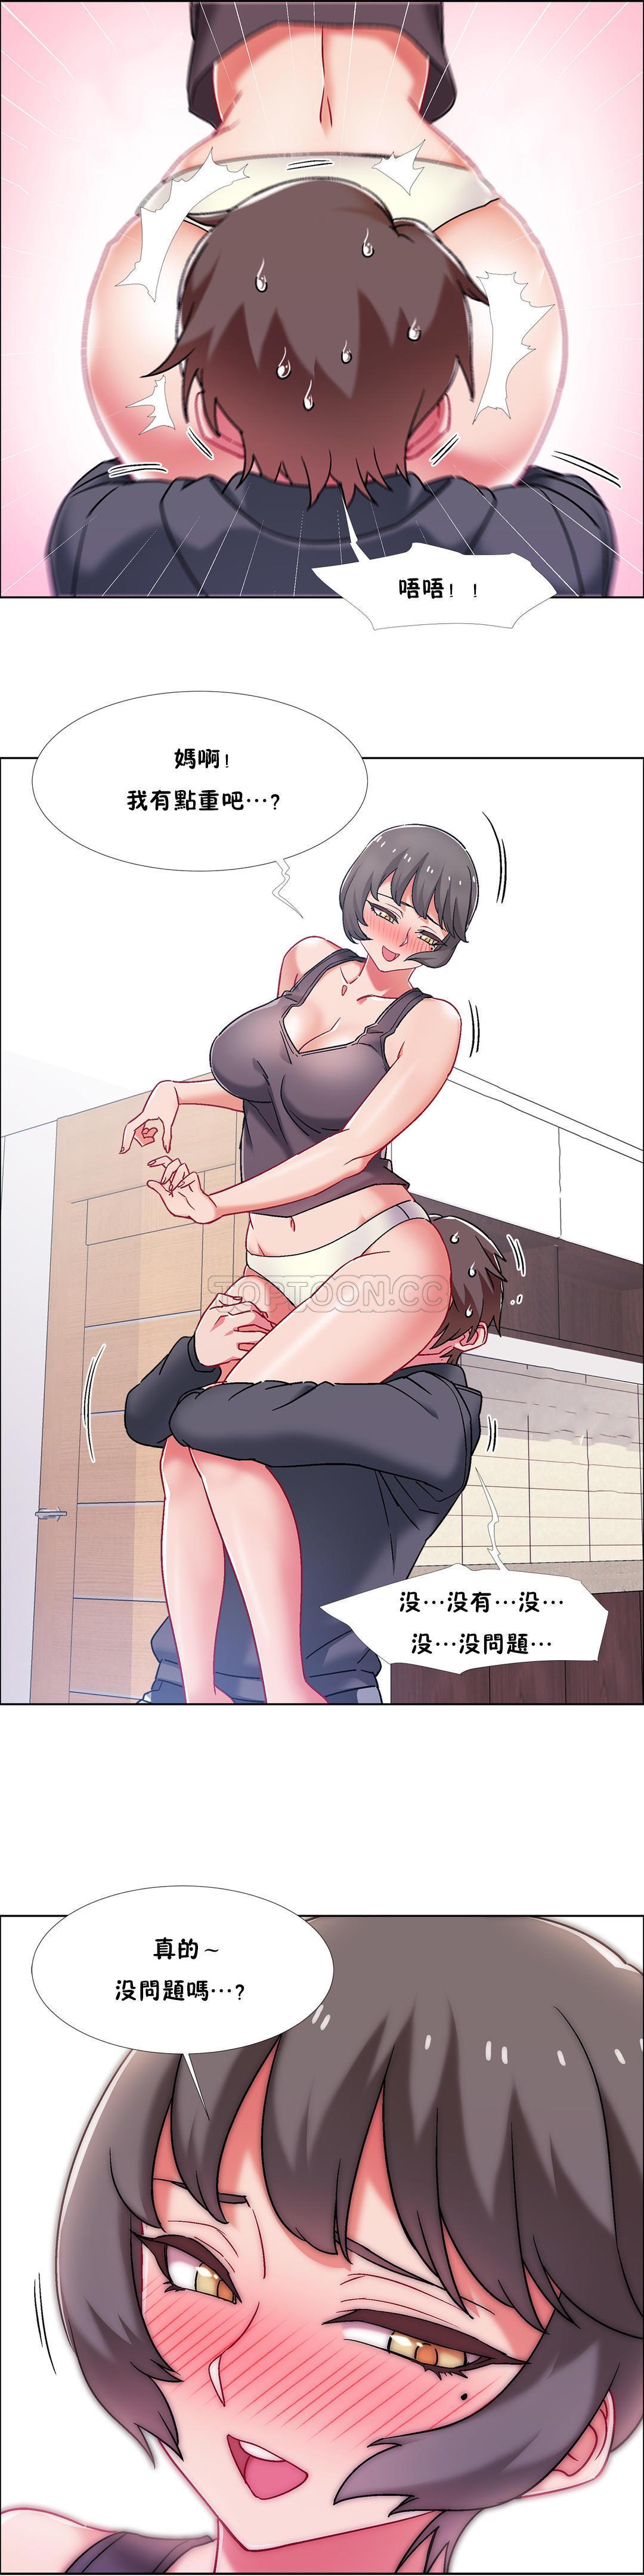 [Studio Wannabe] Rental Girls | 出租女郎 Ch. 33-58 [Chinese]  第二季 完结 308